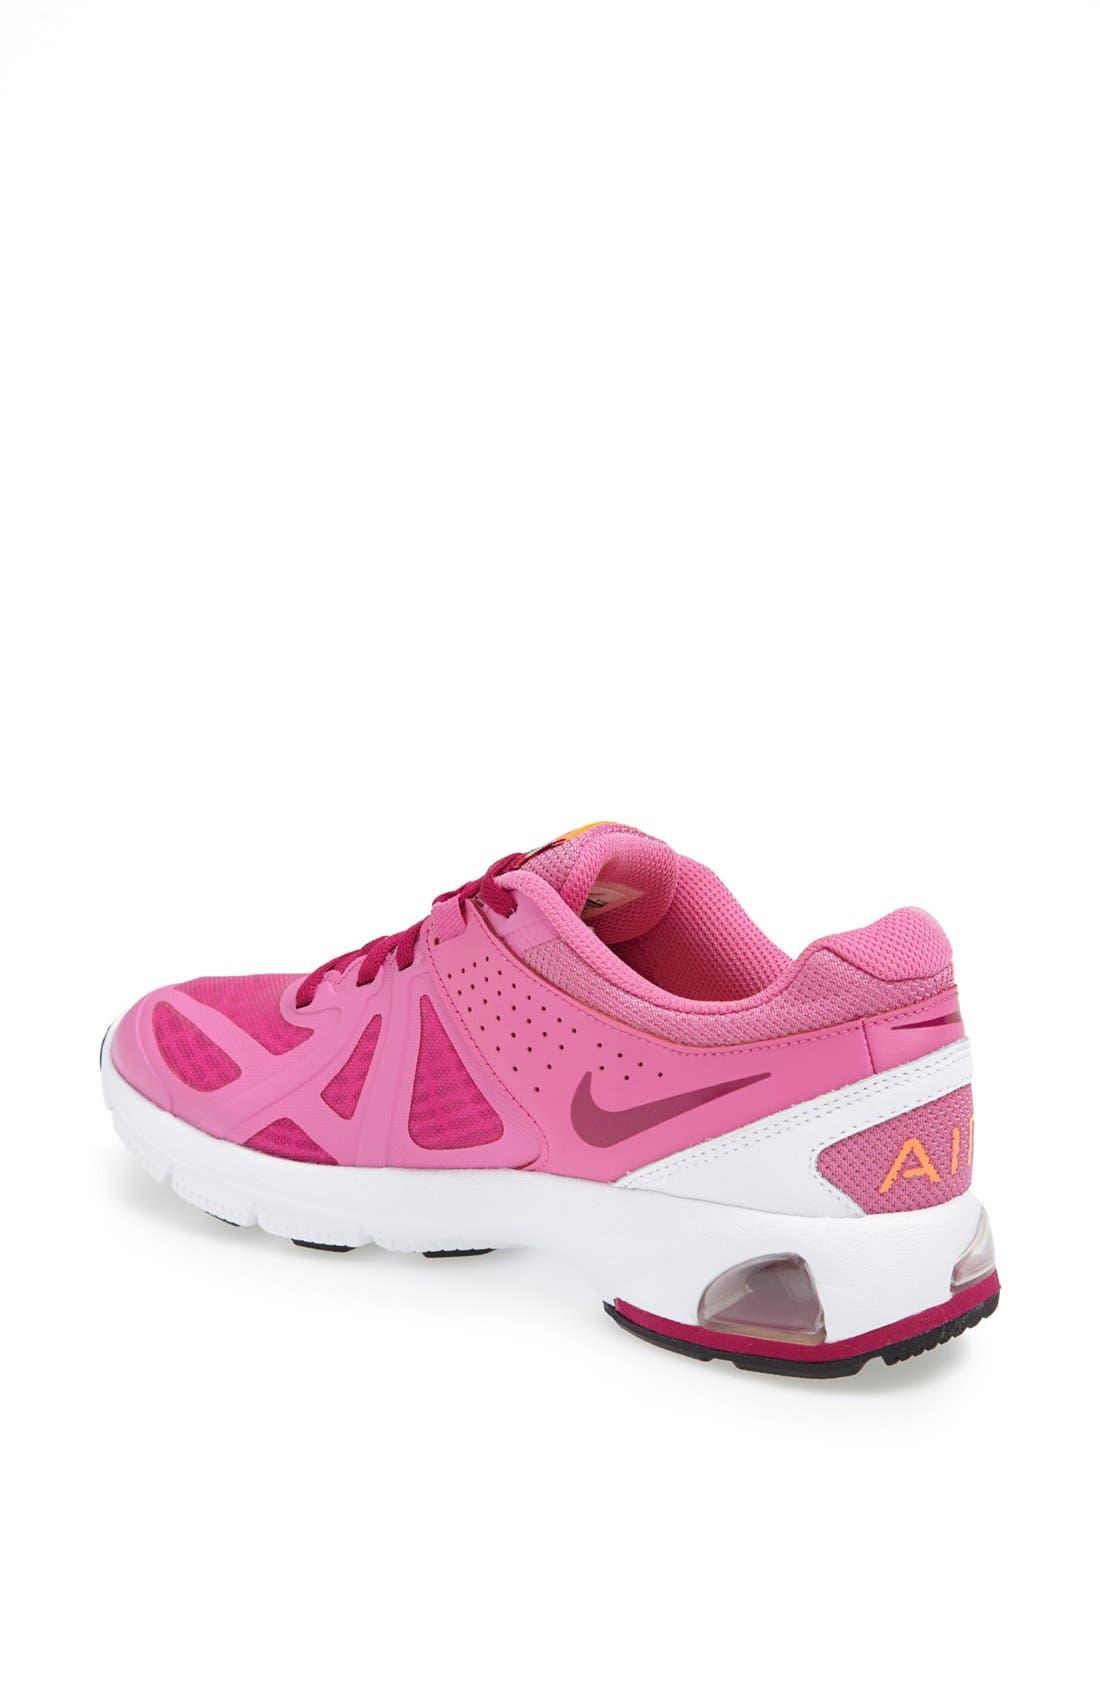 Alternate Image 3  - Nike 'Air Max Run Lite 5' Running Shoe (Women)